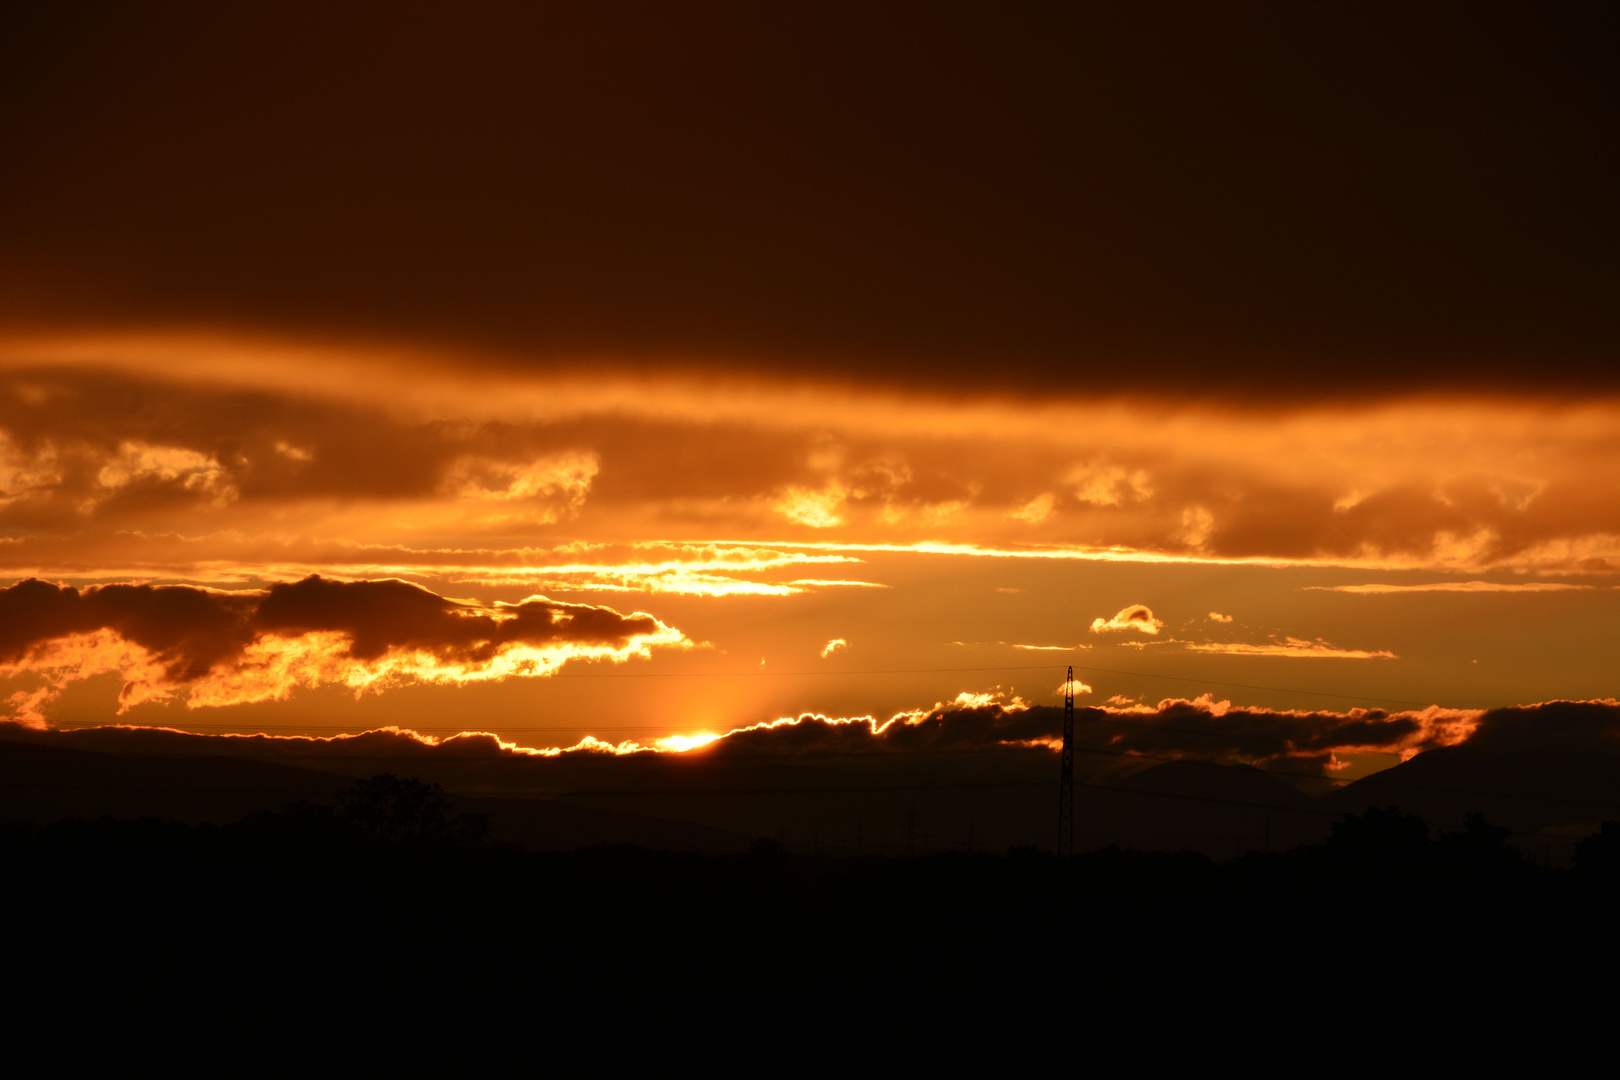 Abendsonne hinter dem Wolkenmeer